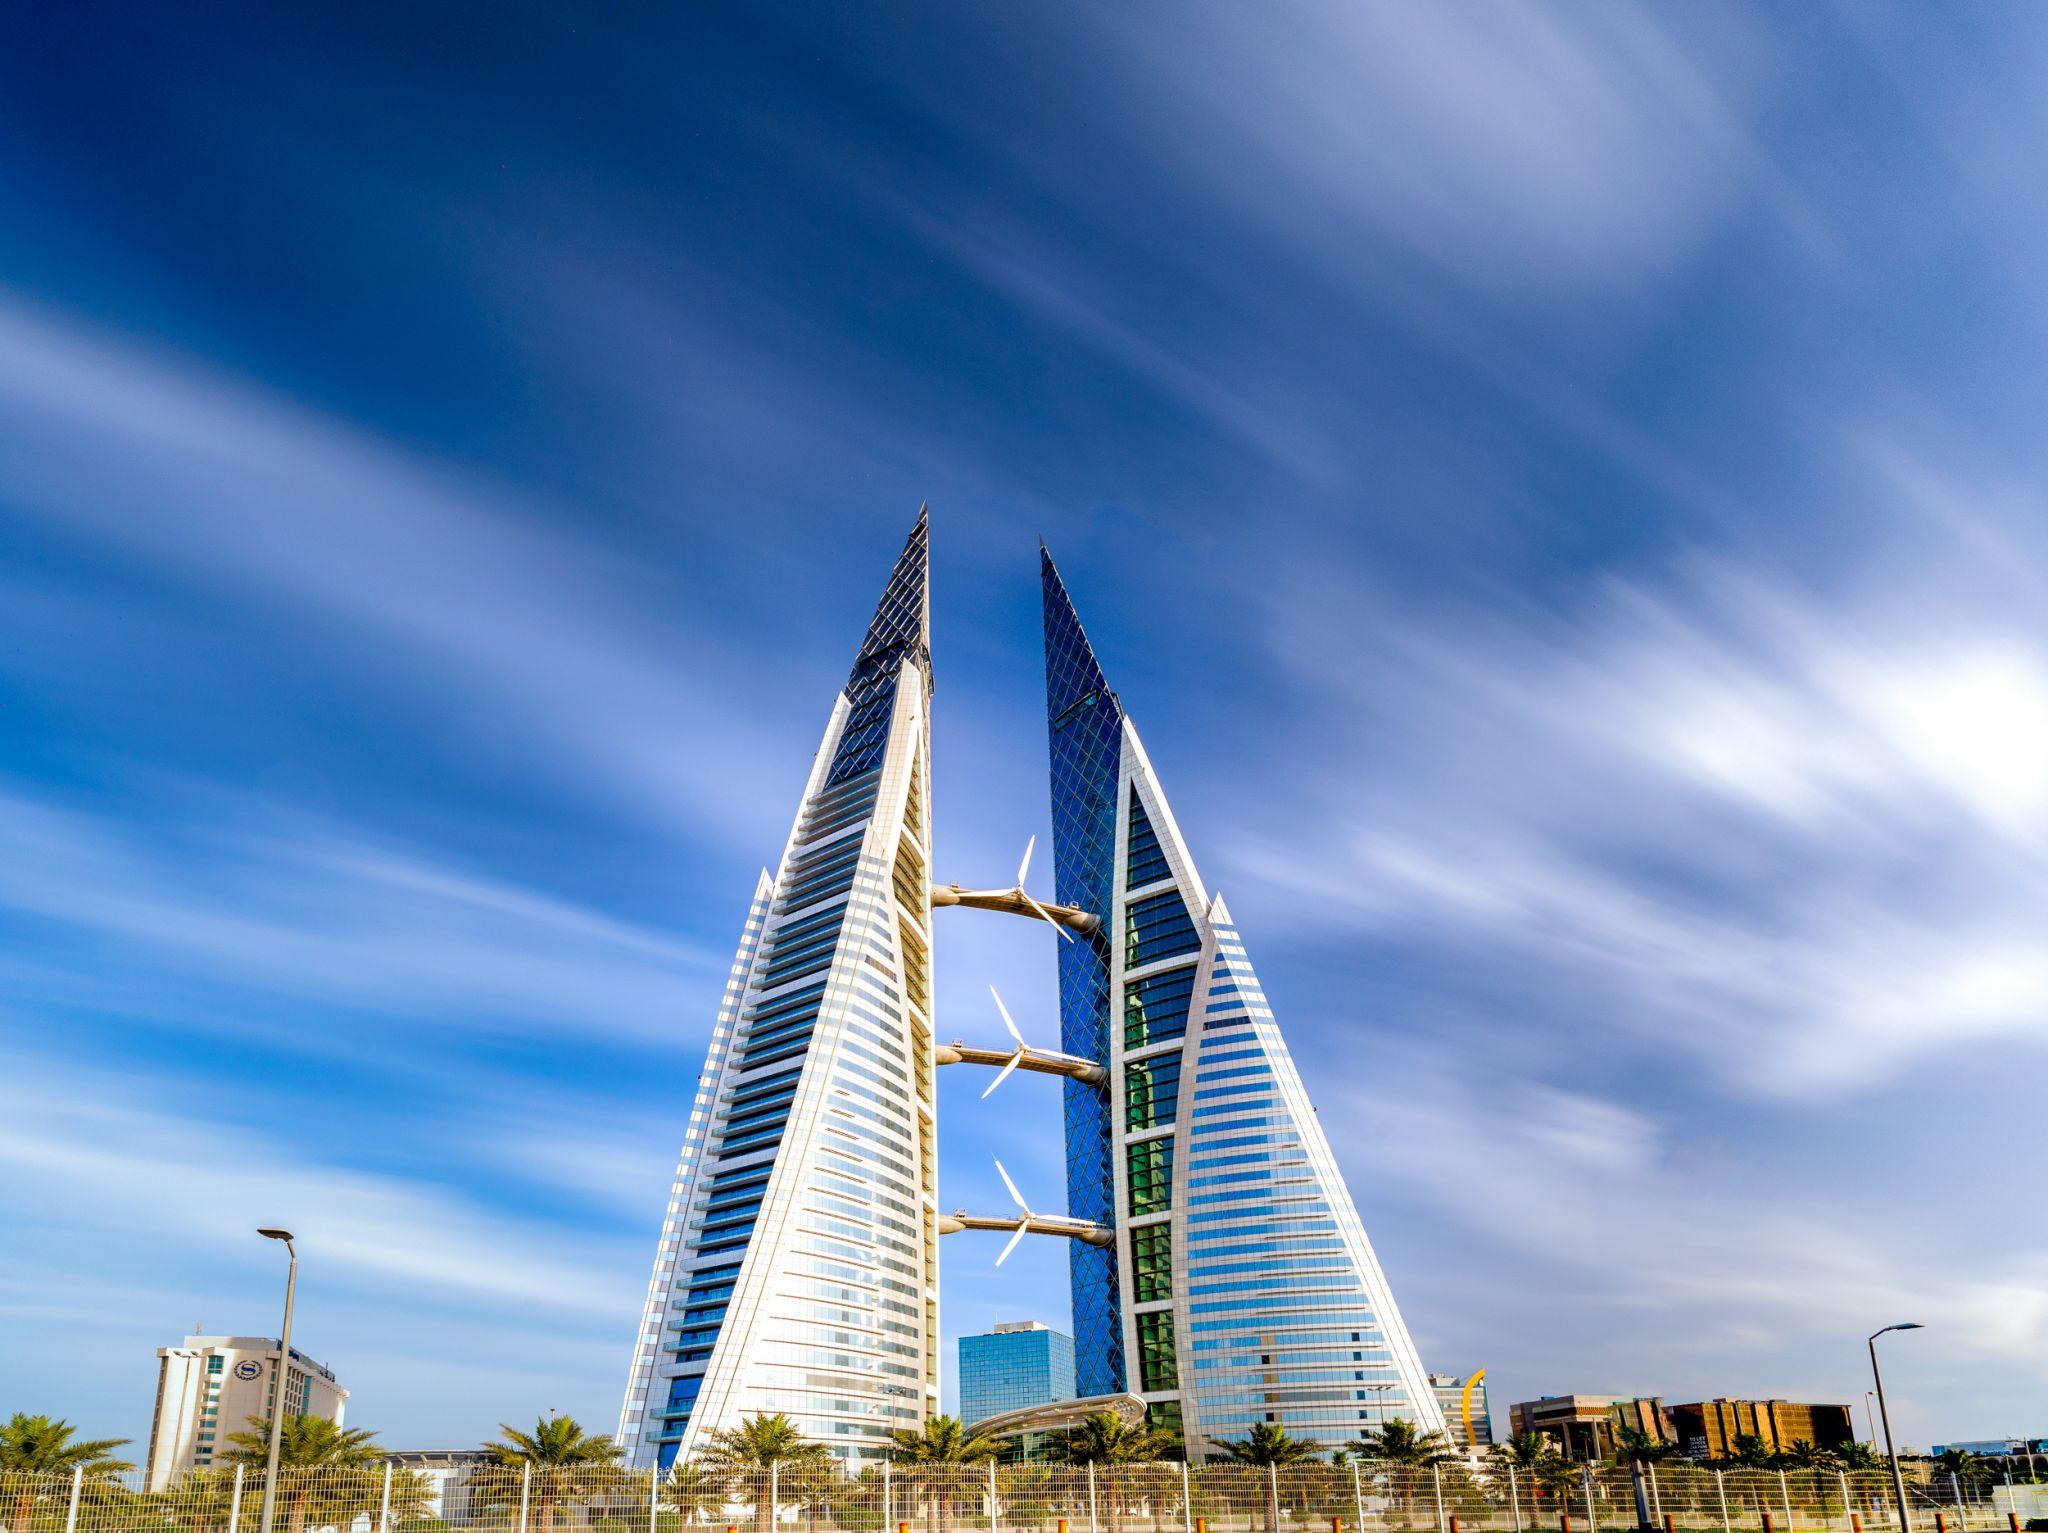 bahrain world trade center, Bahrain